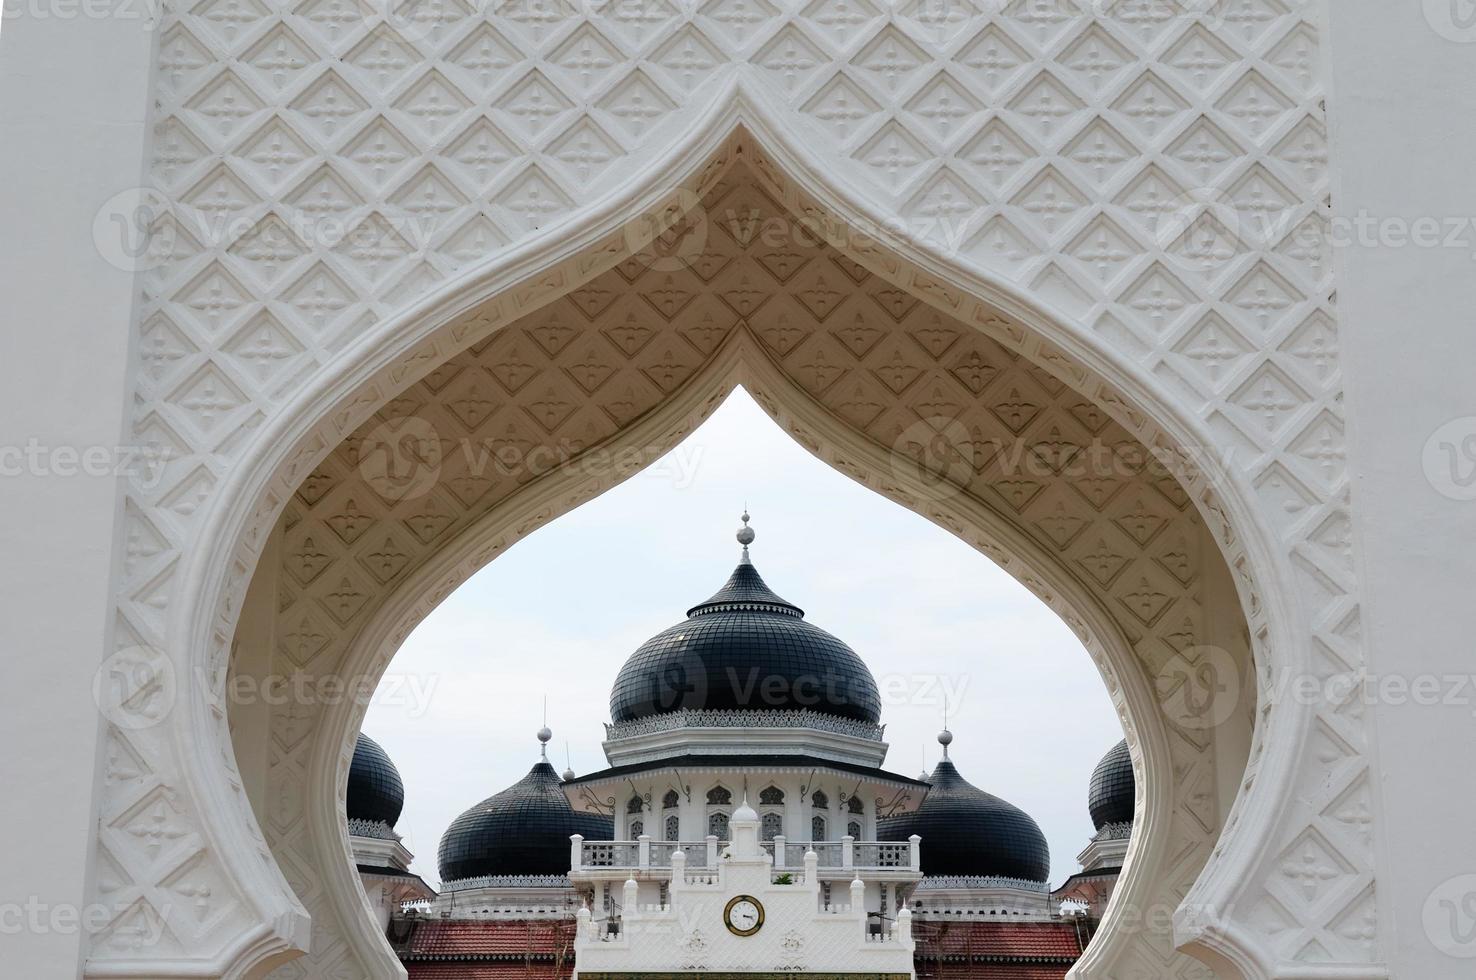 indonesische moslimarchitectuur, banda aceh foto